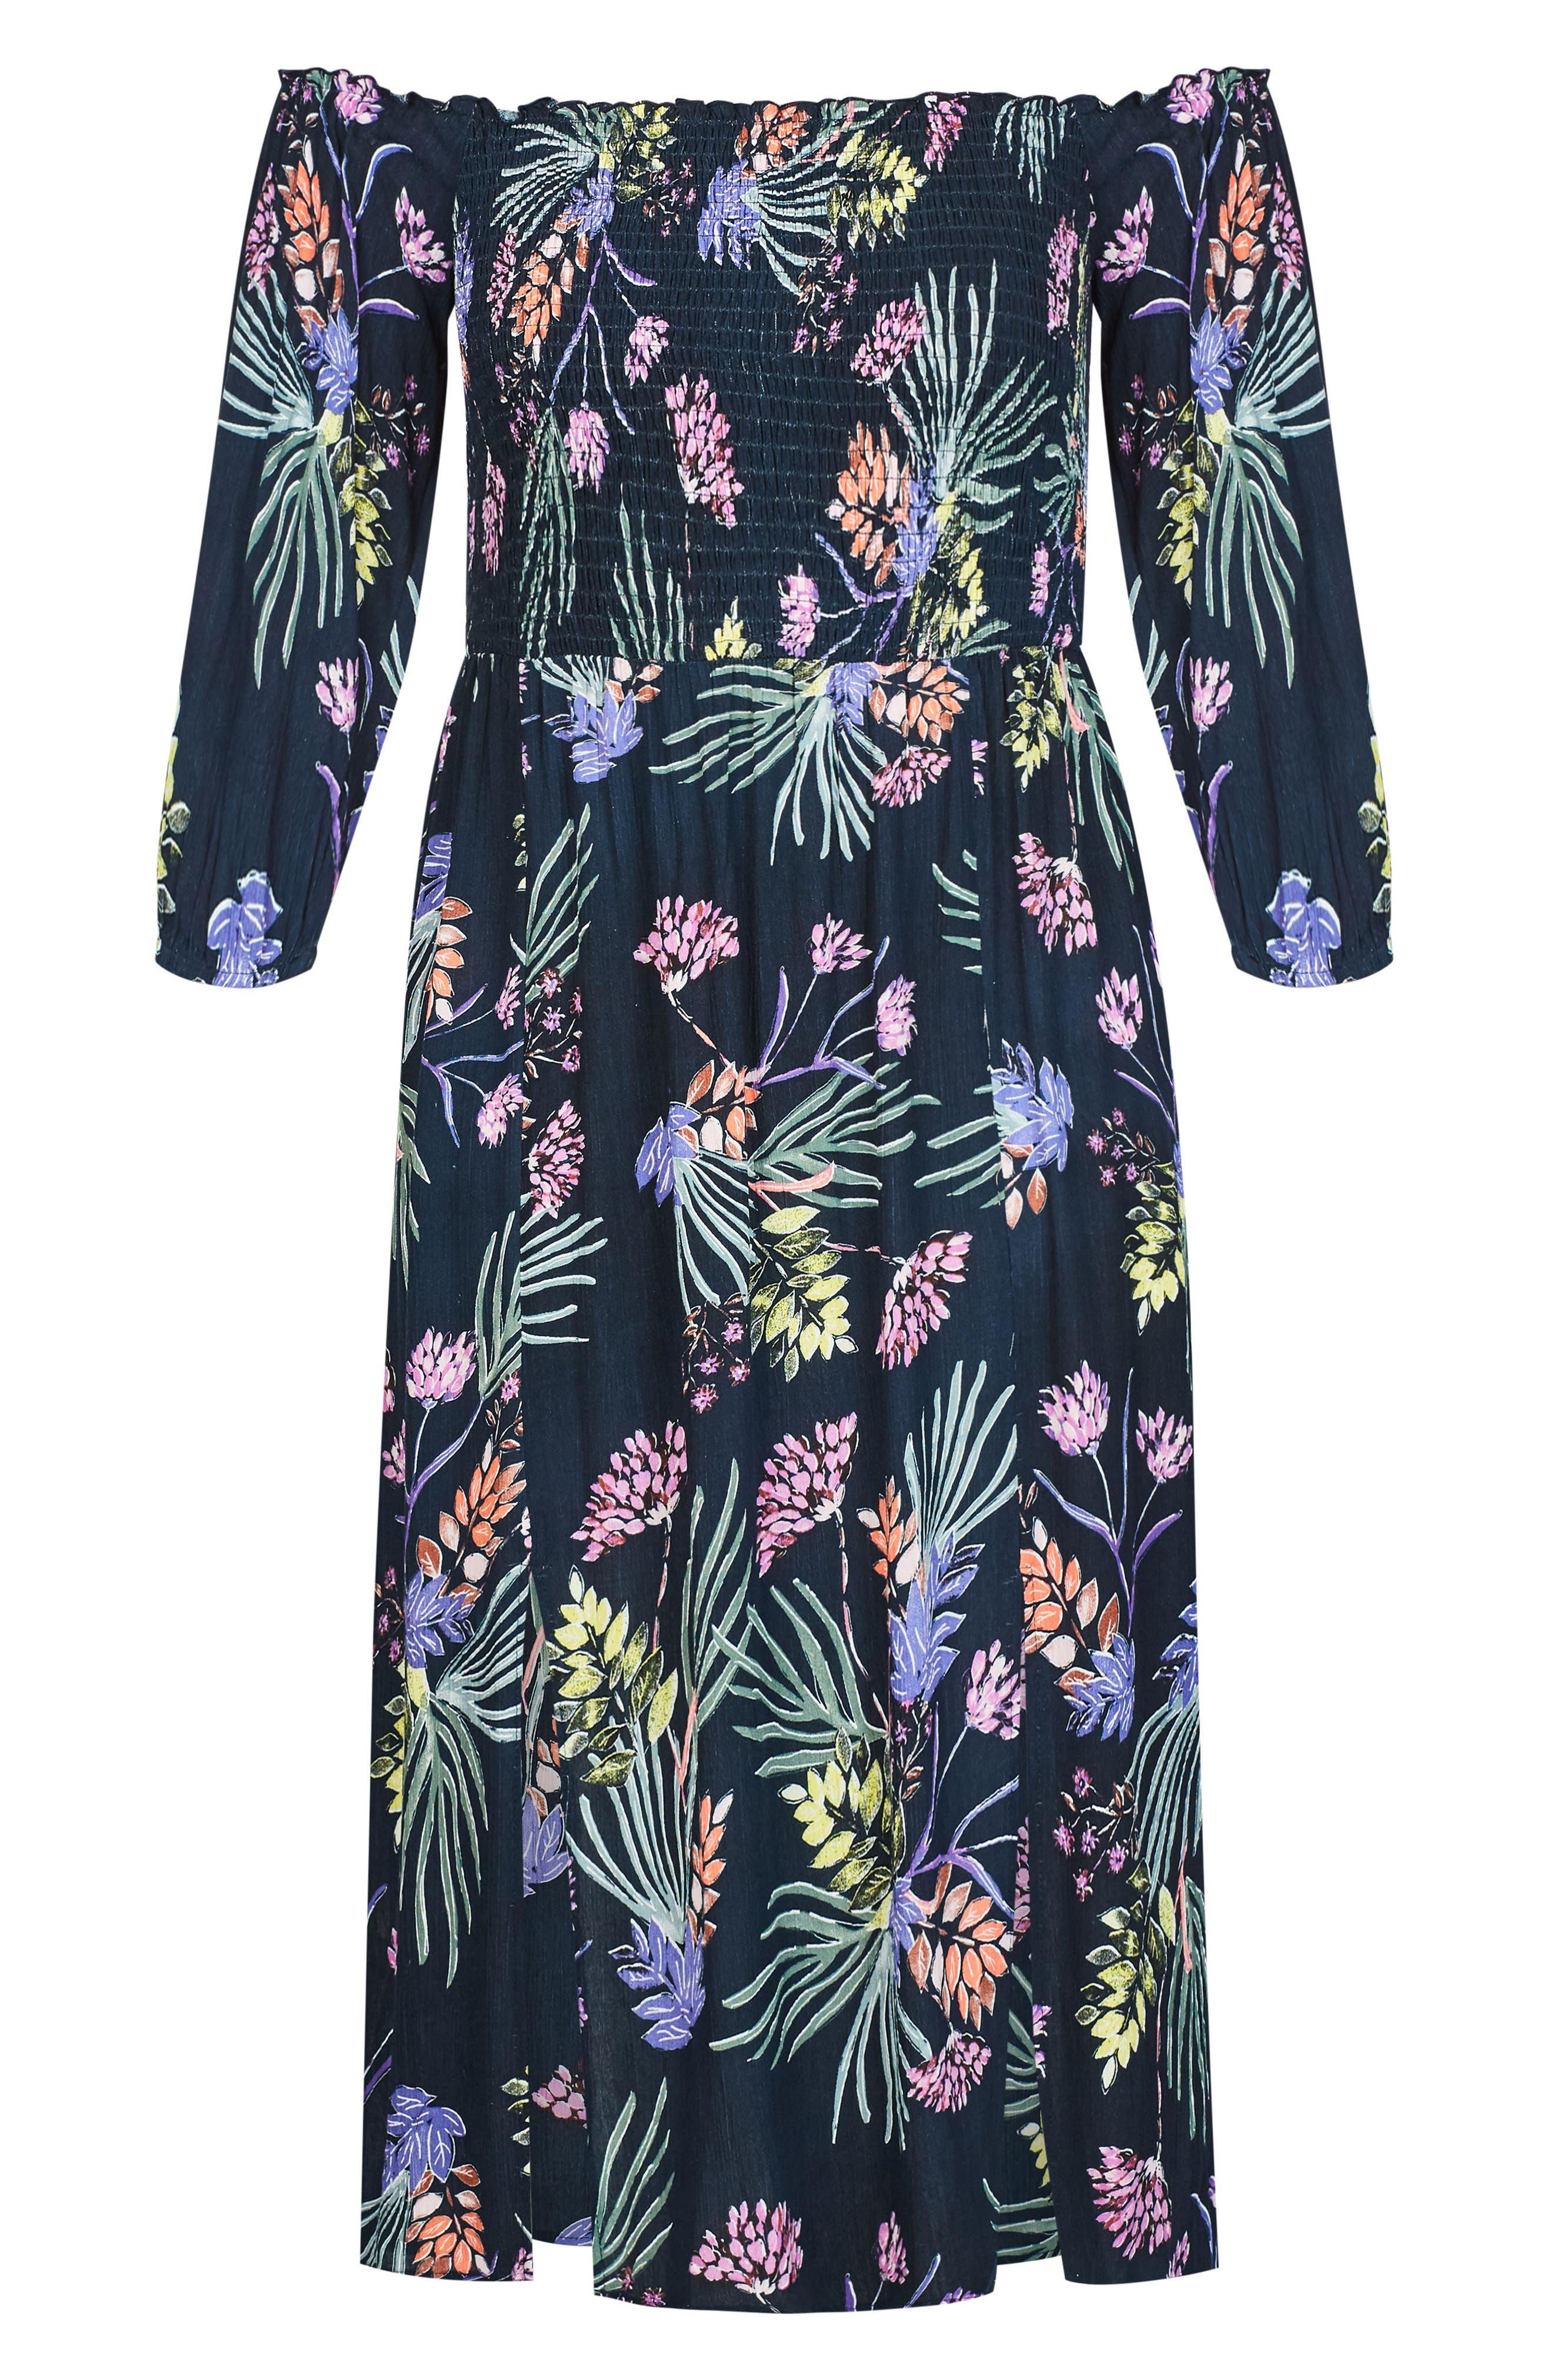 Island Floral Off the Shoulder Midi Dress,                             Alternate thumbnail 3, color,                             EXOTIC GARDEN